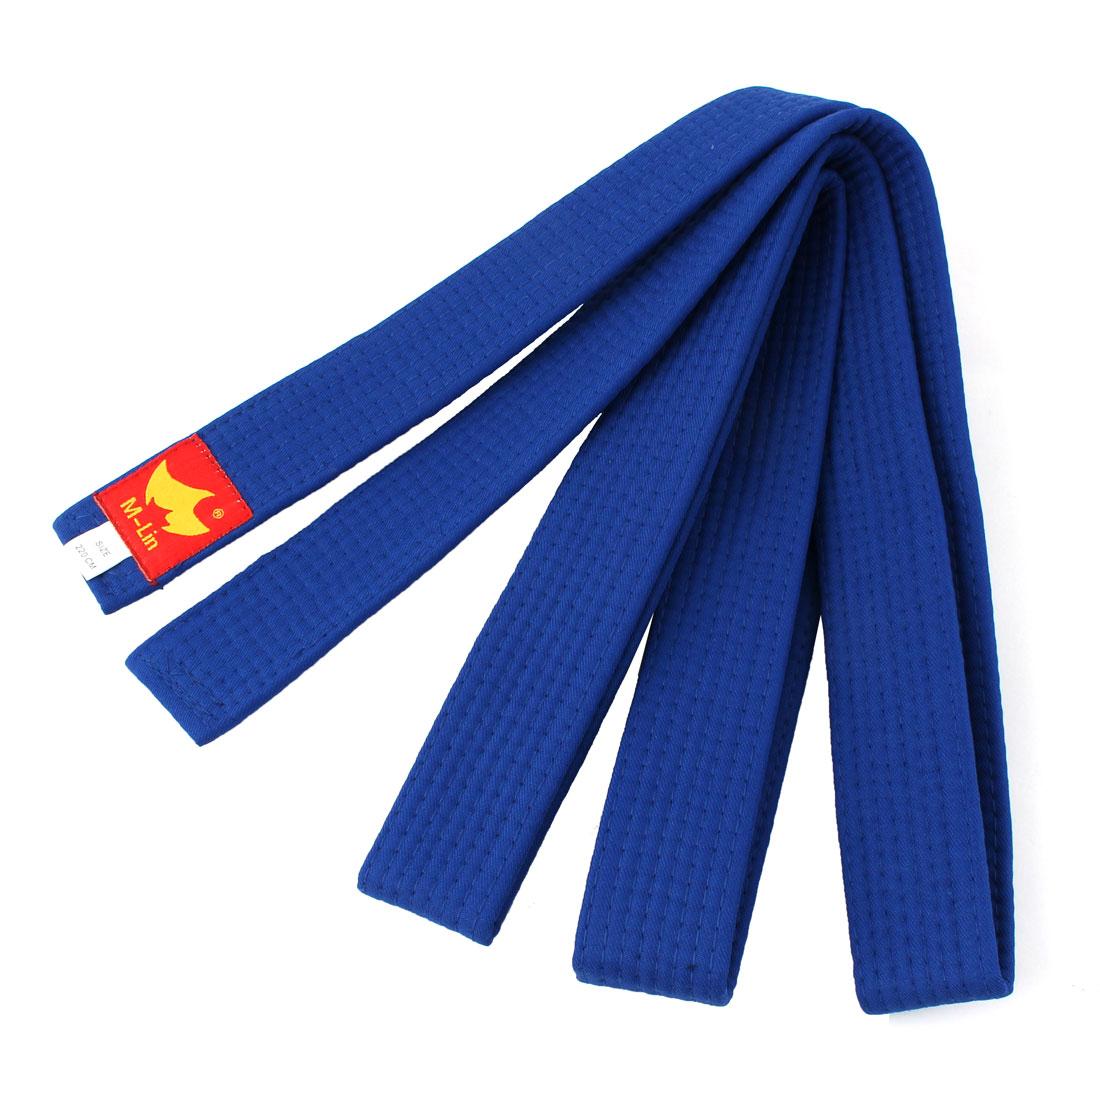 Taekwondo Cotton Blend Sporty Band Belt Blue 220cm Length